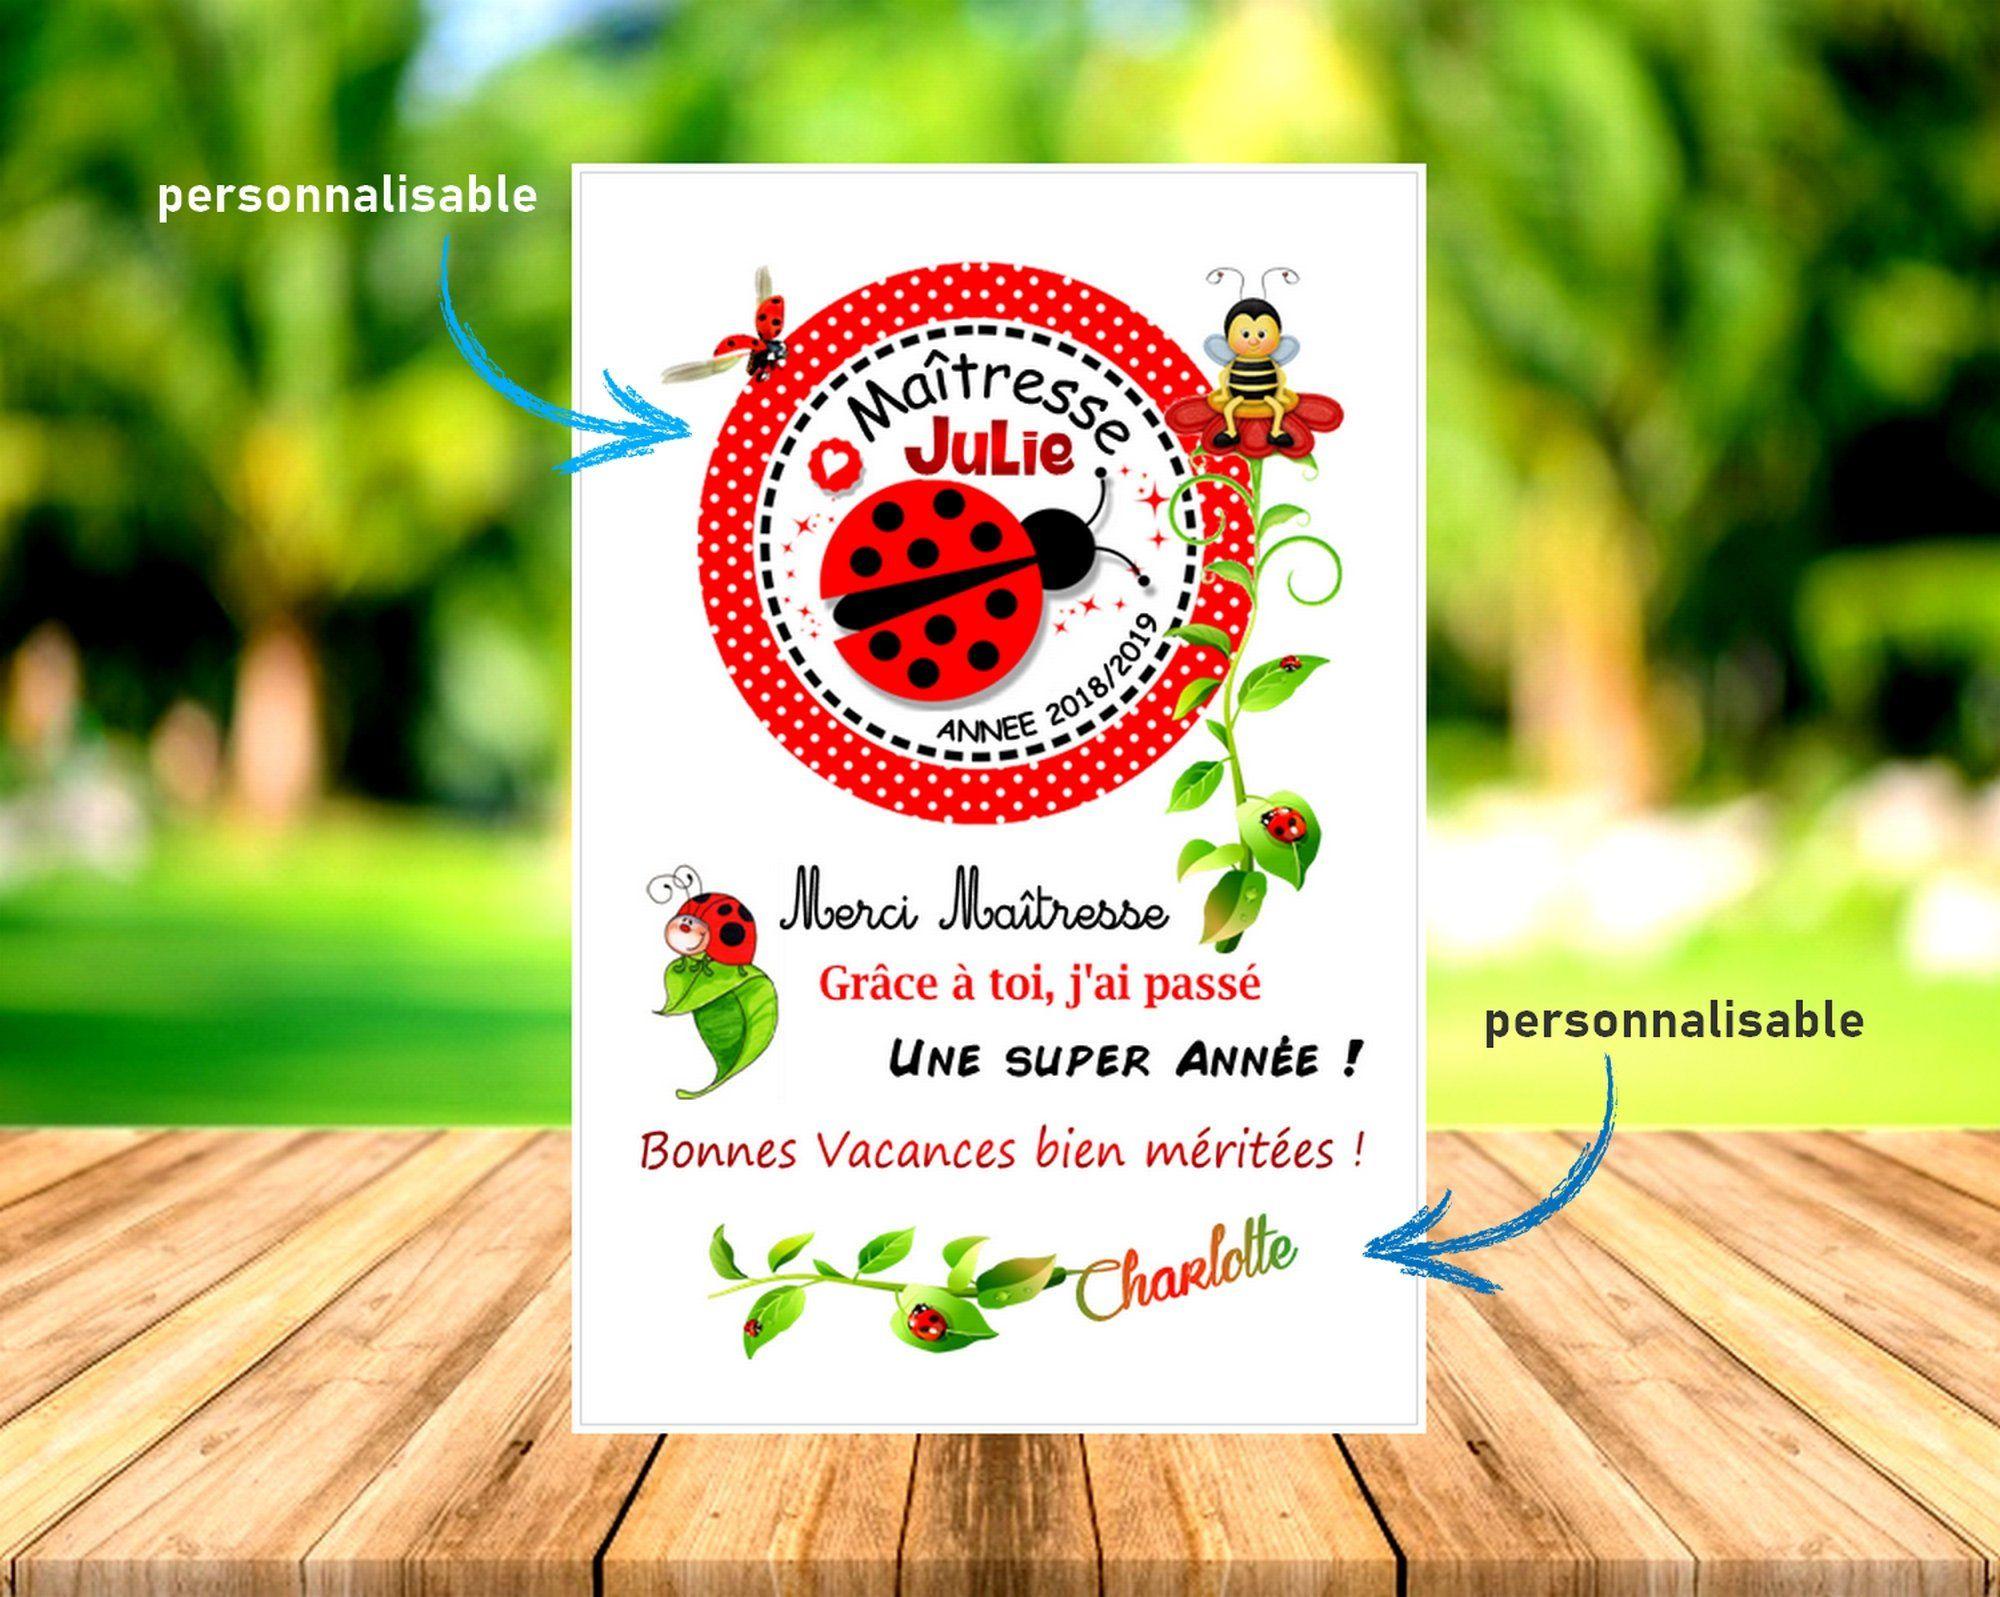 Carte Personnalisée Cadeau Maîtresse Atsem Avs Nounou Tata